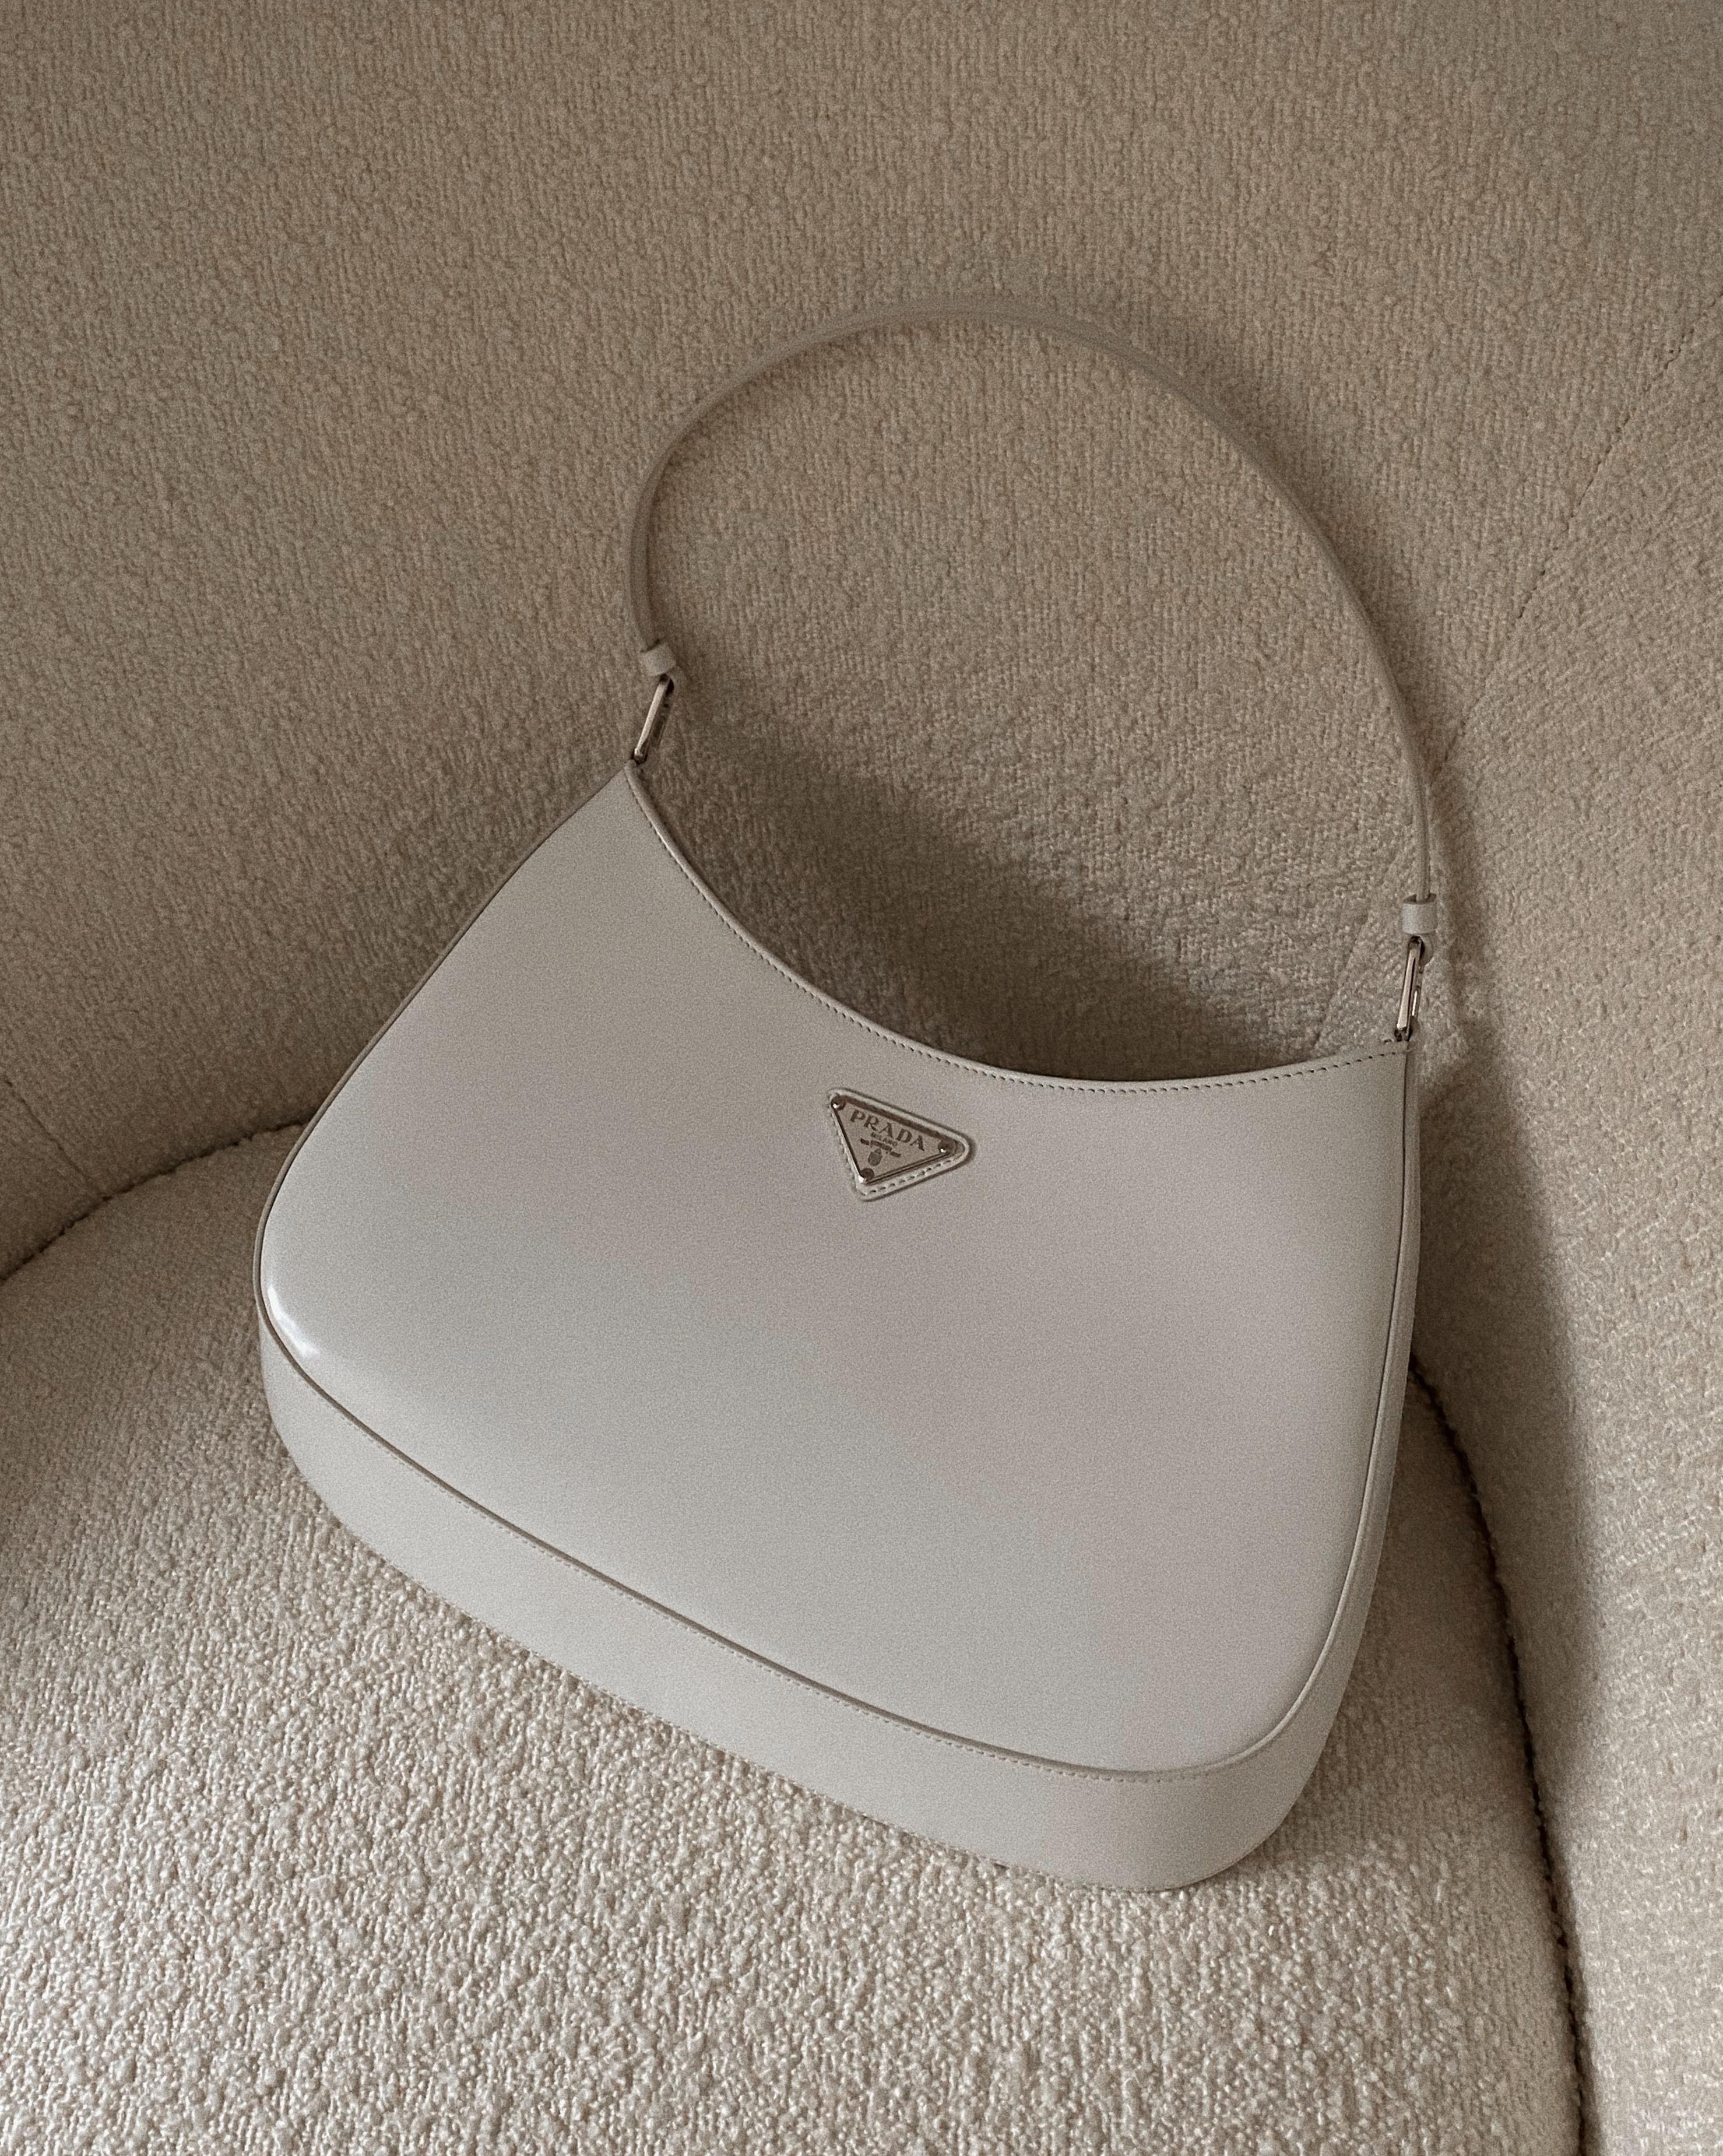 Prada Cleo White Bag- 2021 Fashion Trends